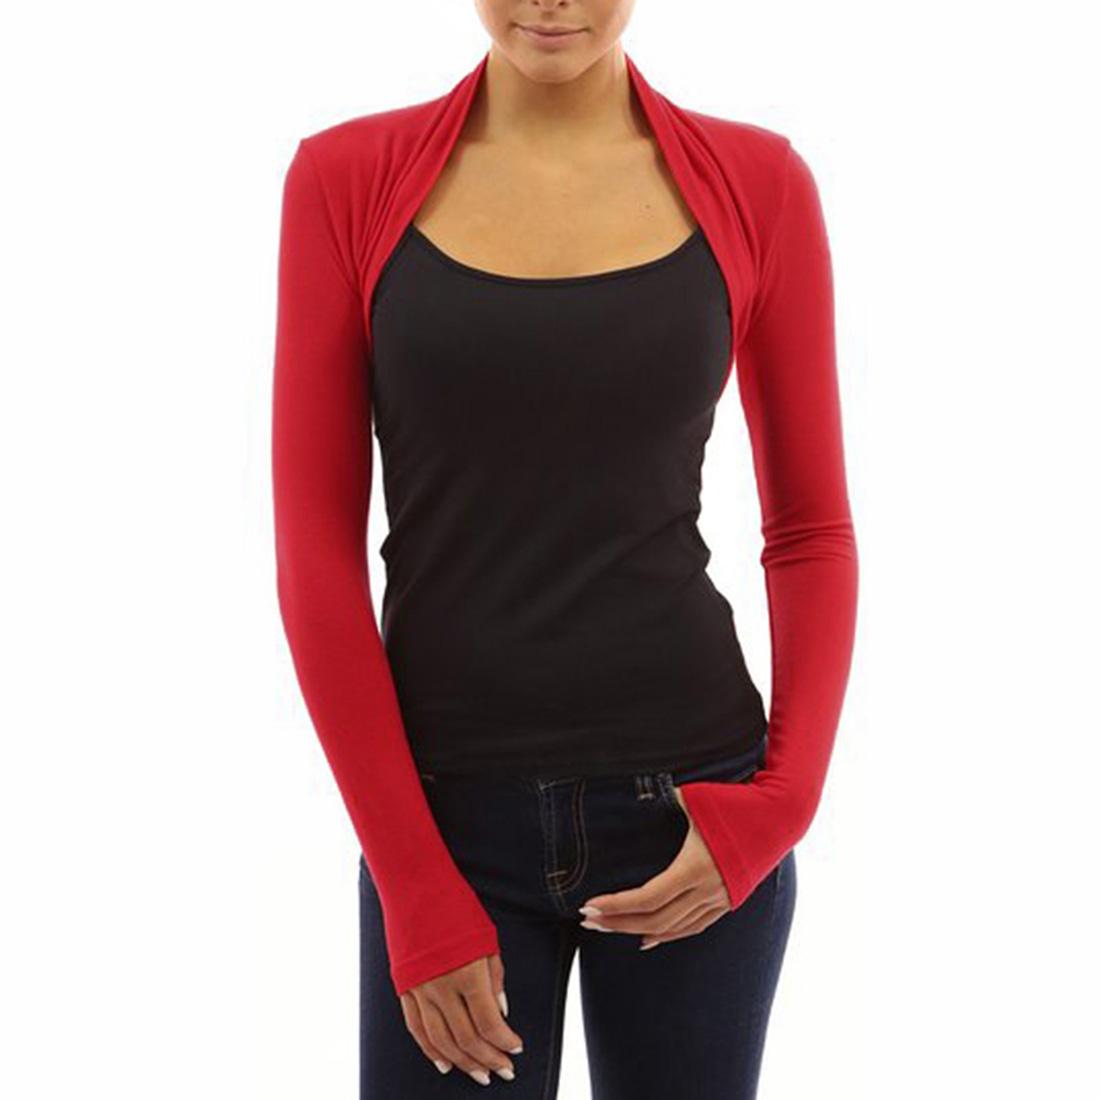 Womens Long Sleeve Bolero Shrug Knit Stretch Cropped Cardigan Top ...